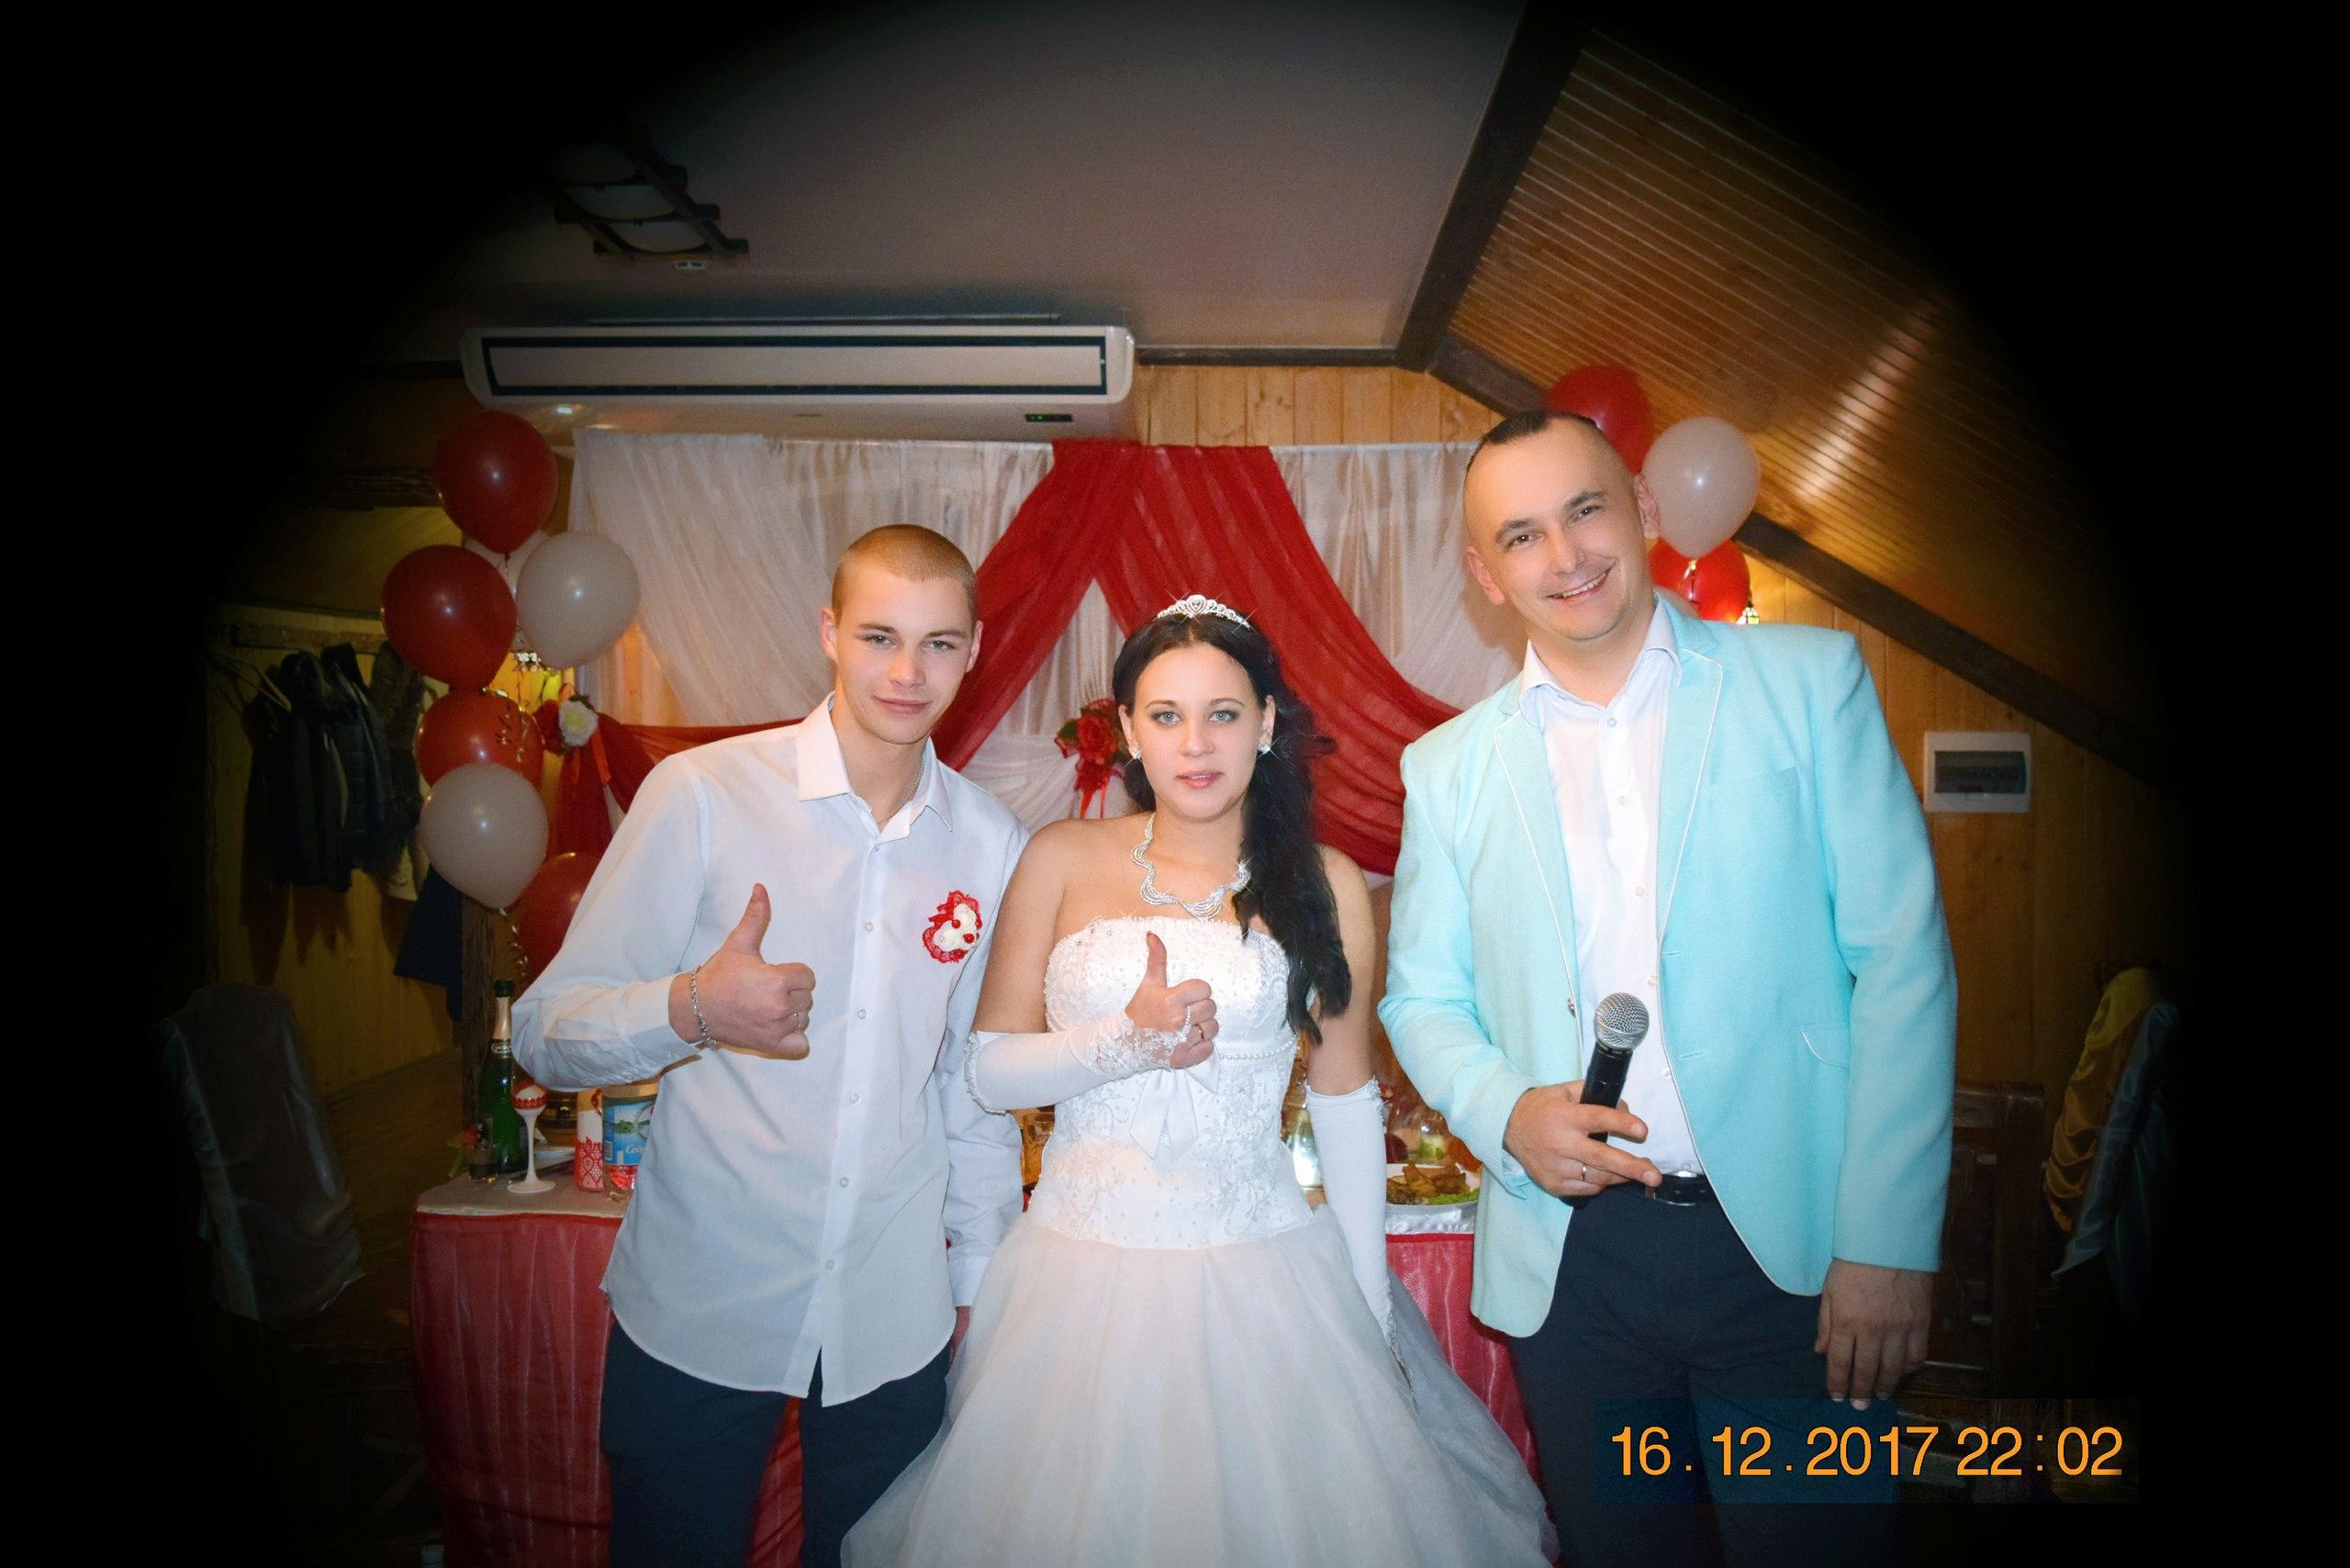 phGxqDbxtQc - Свадьба Виктора и Софьи